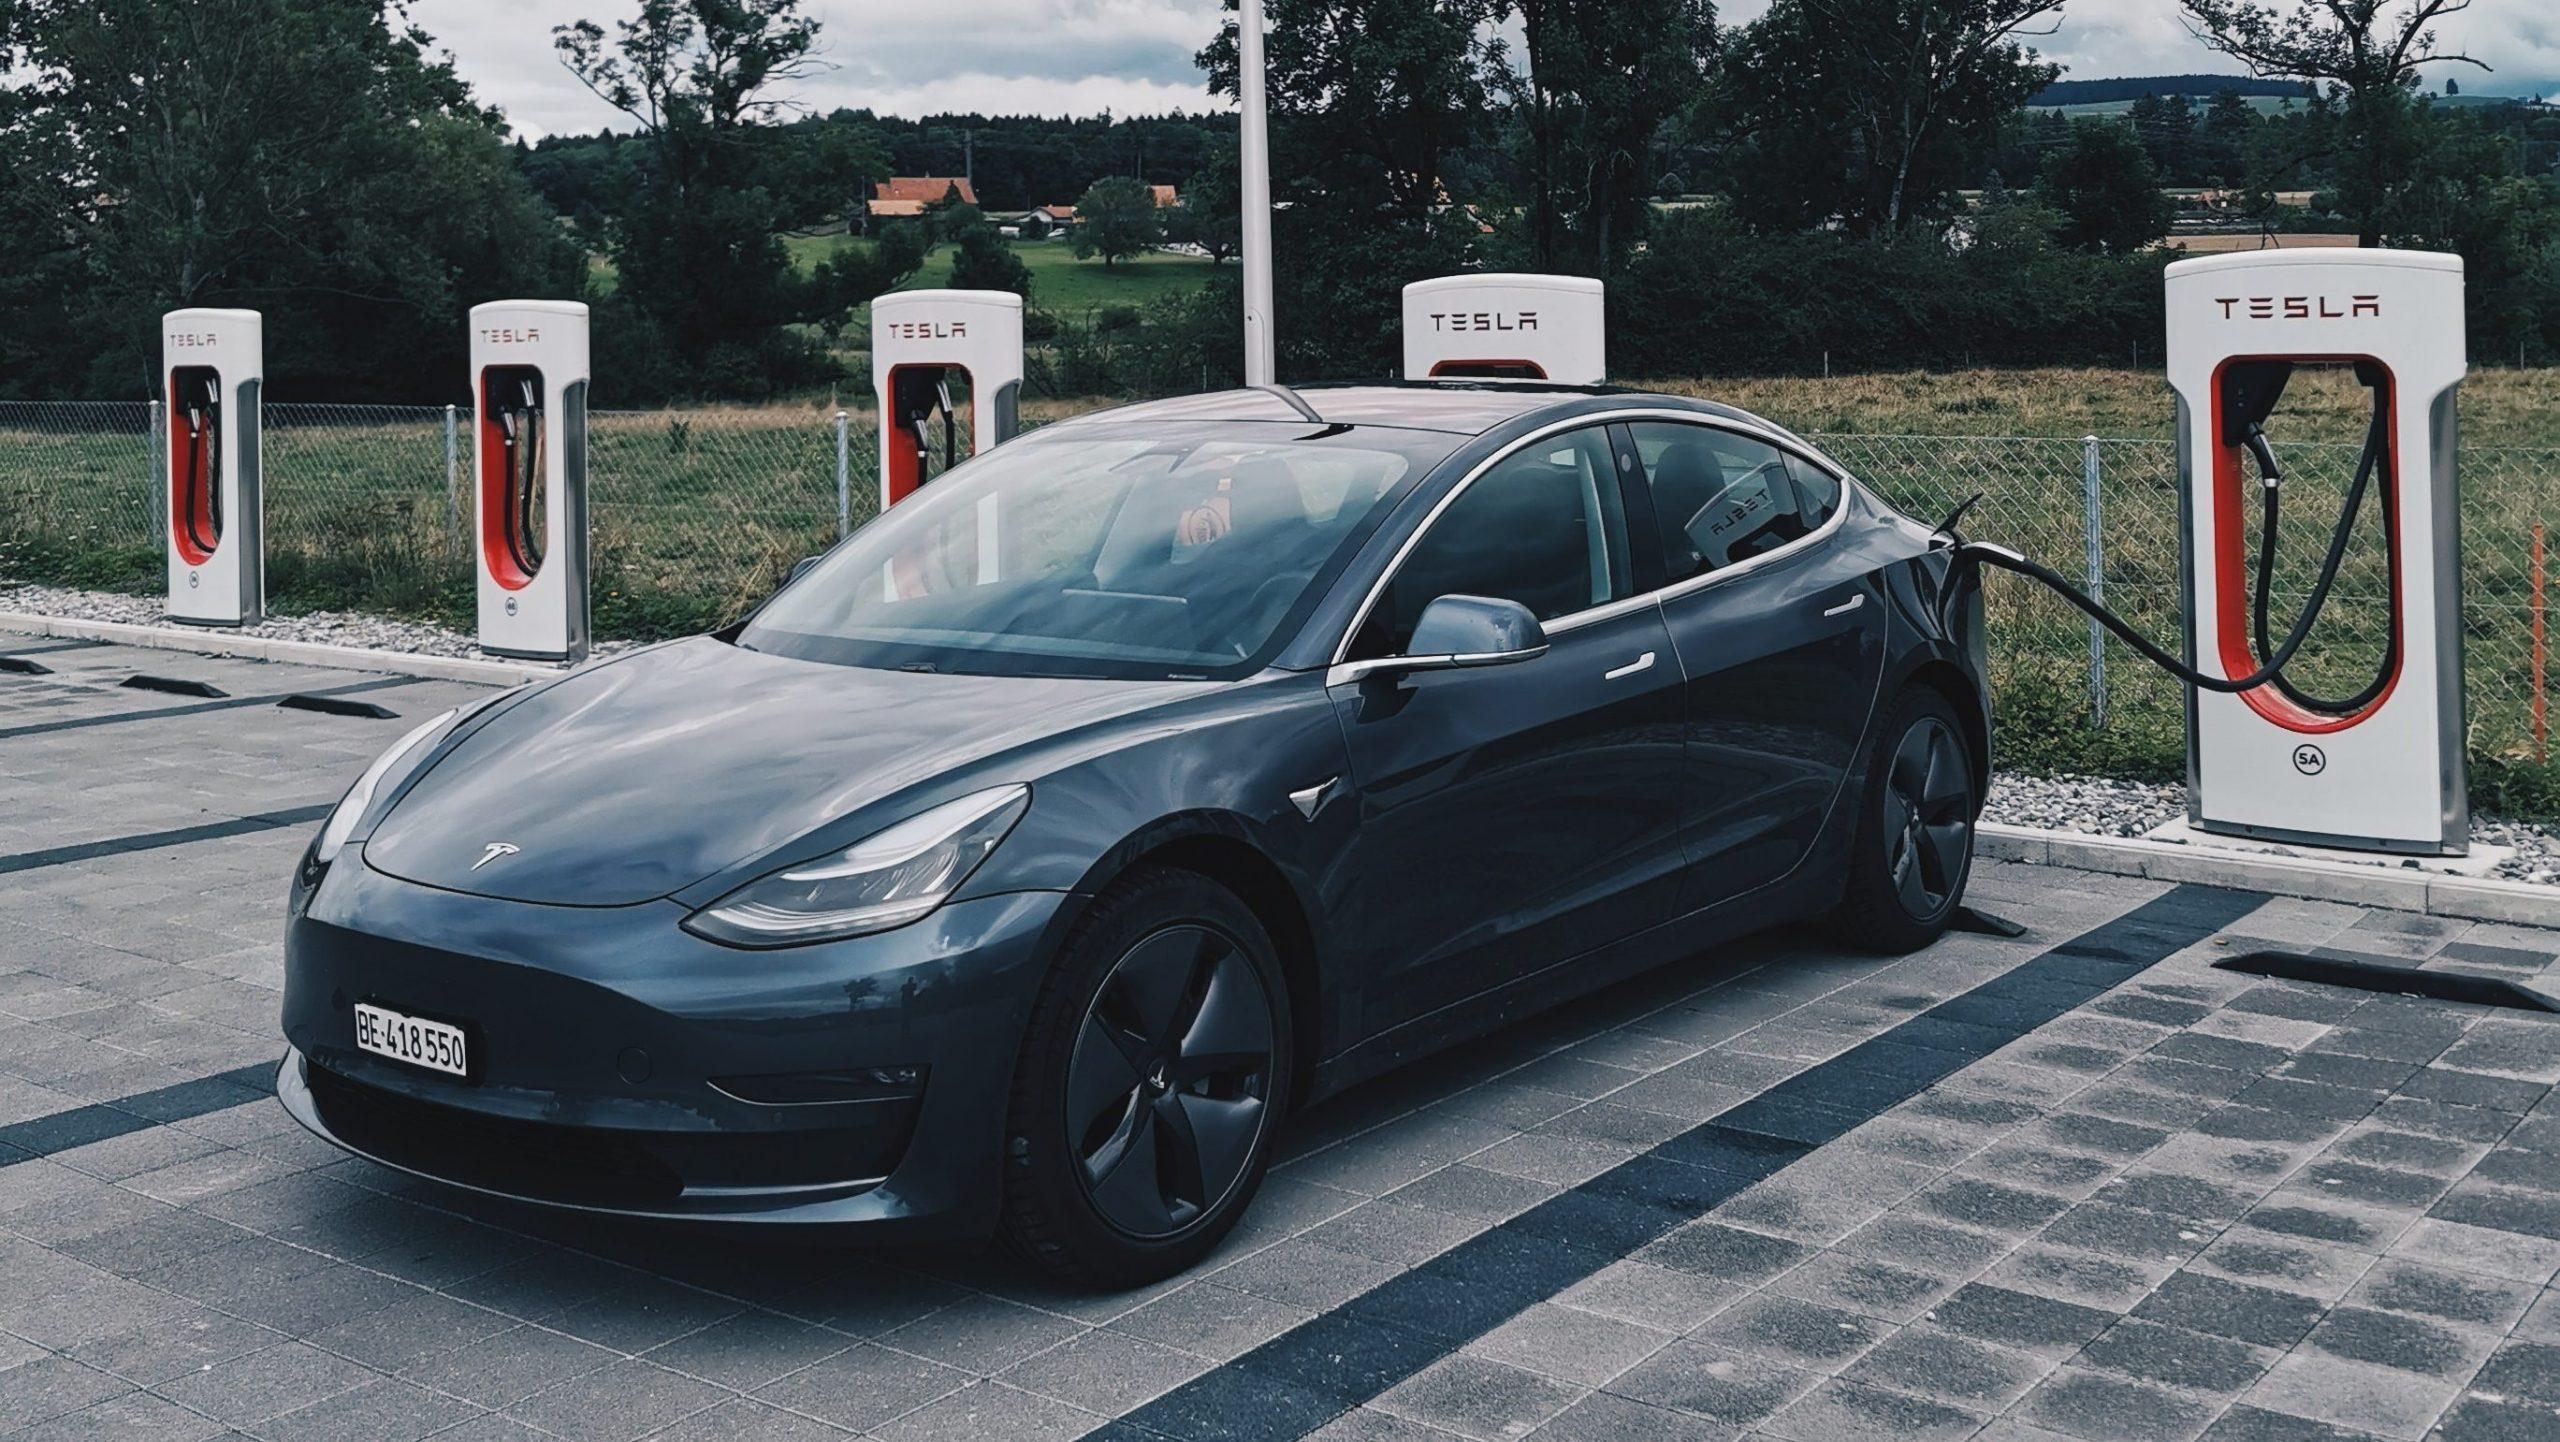 Tesla Model 3 bij Supercharger laadpaal